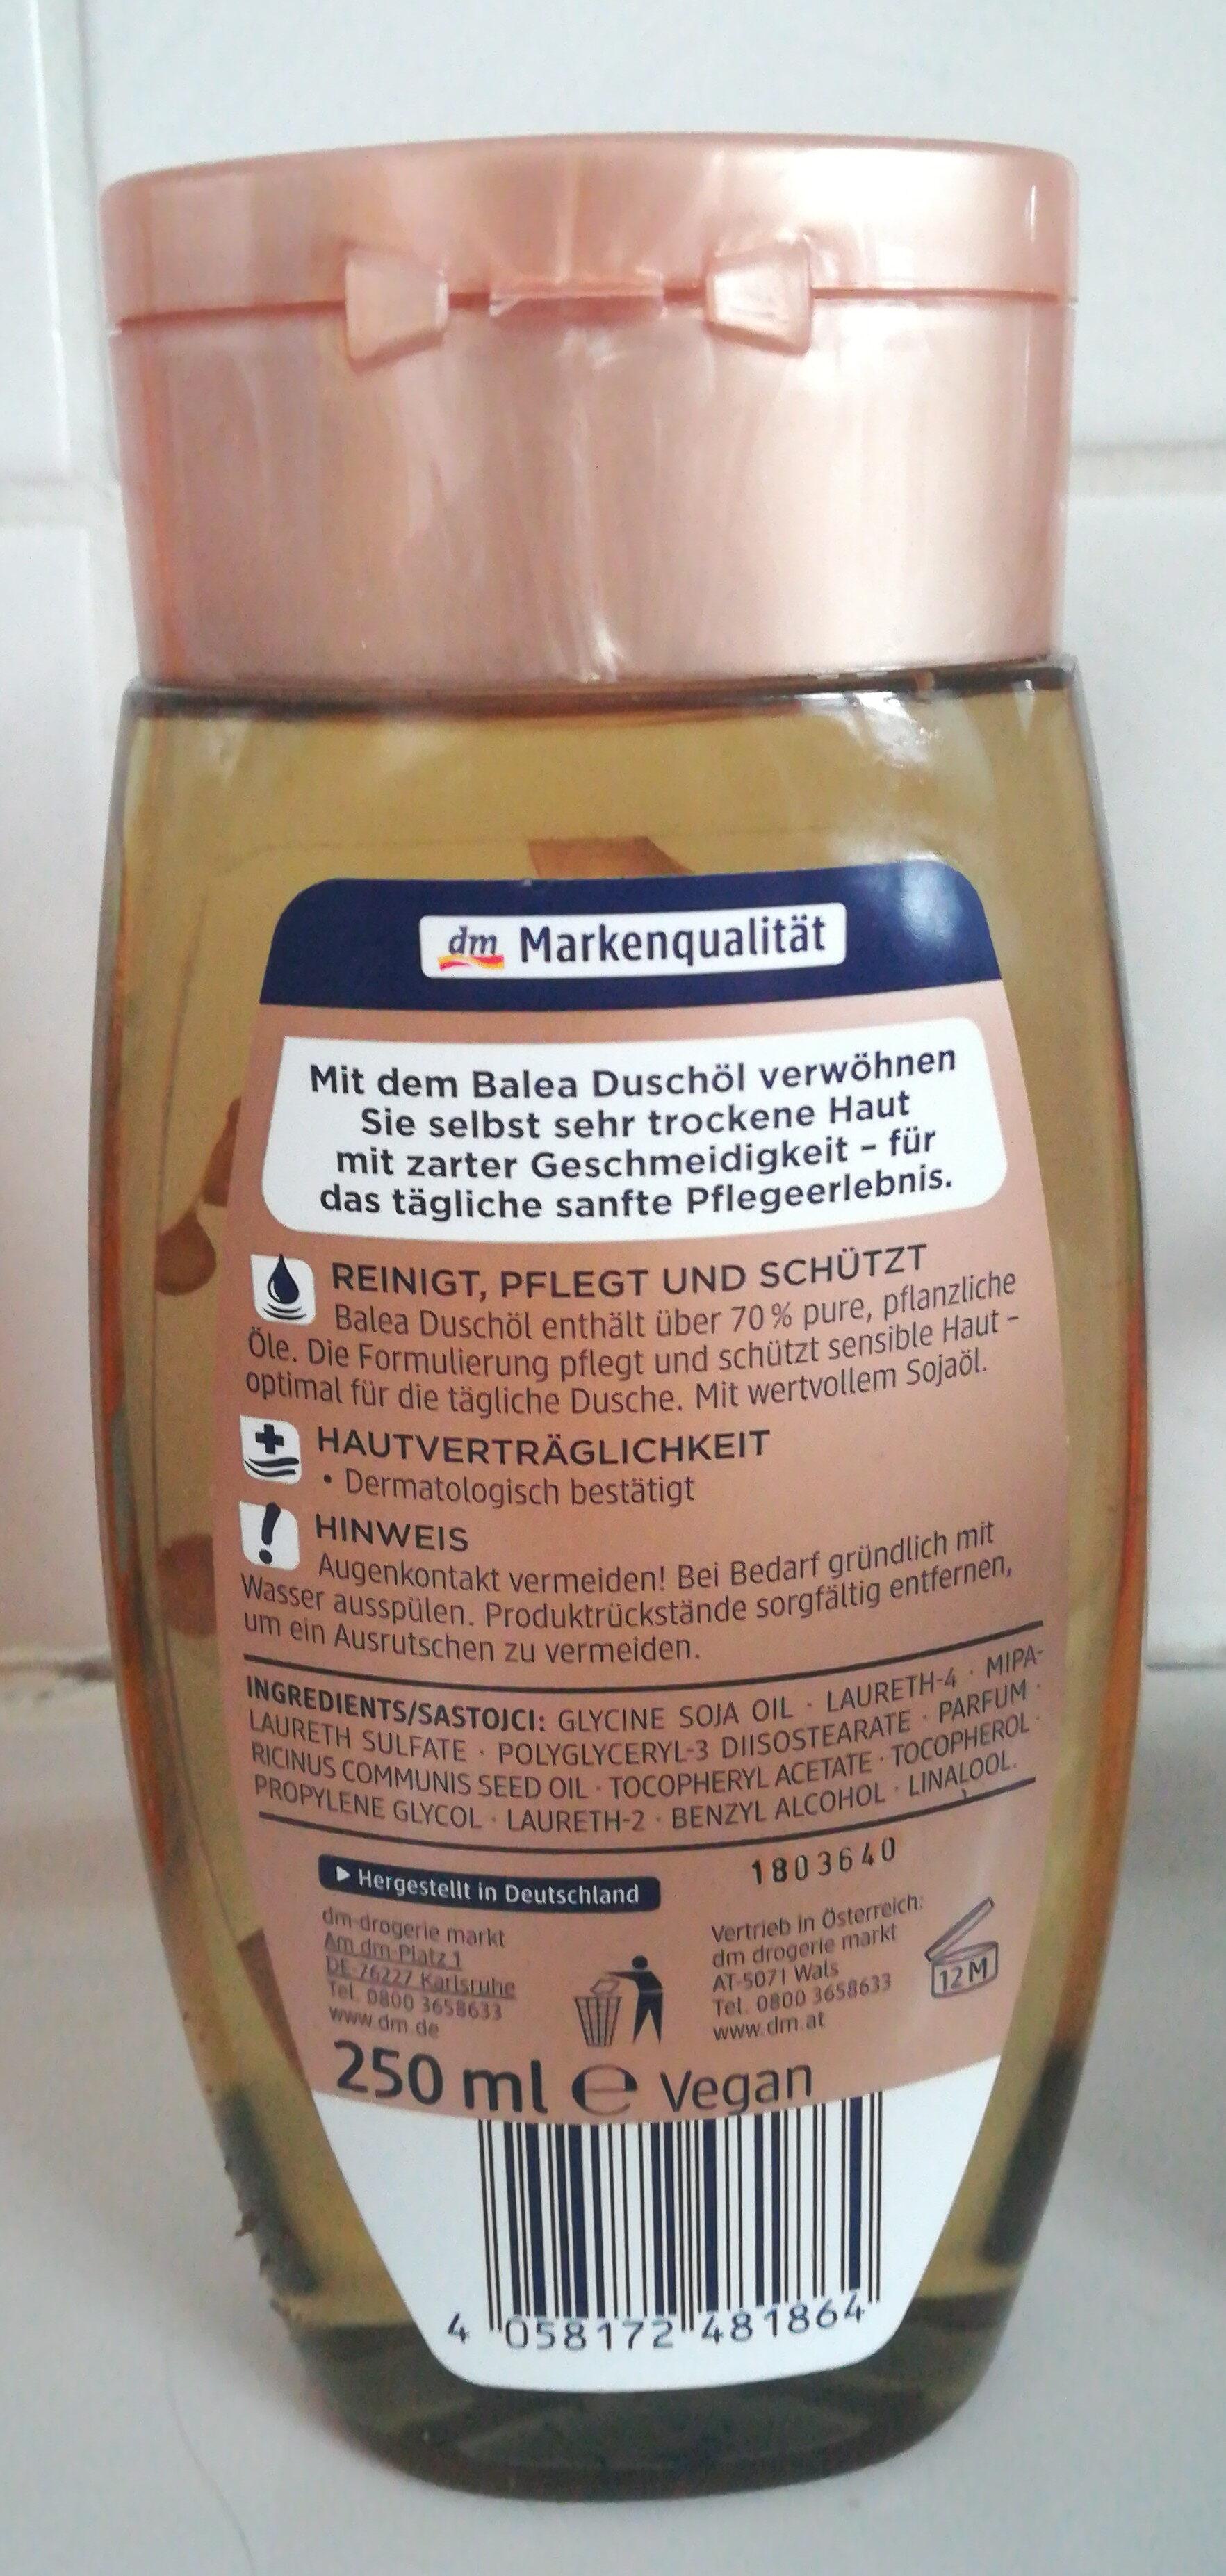 Duschöl - Product - en